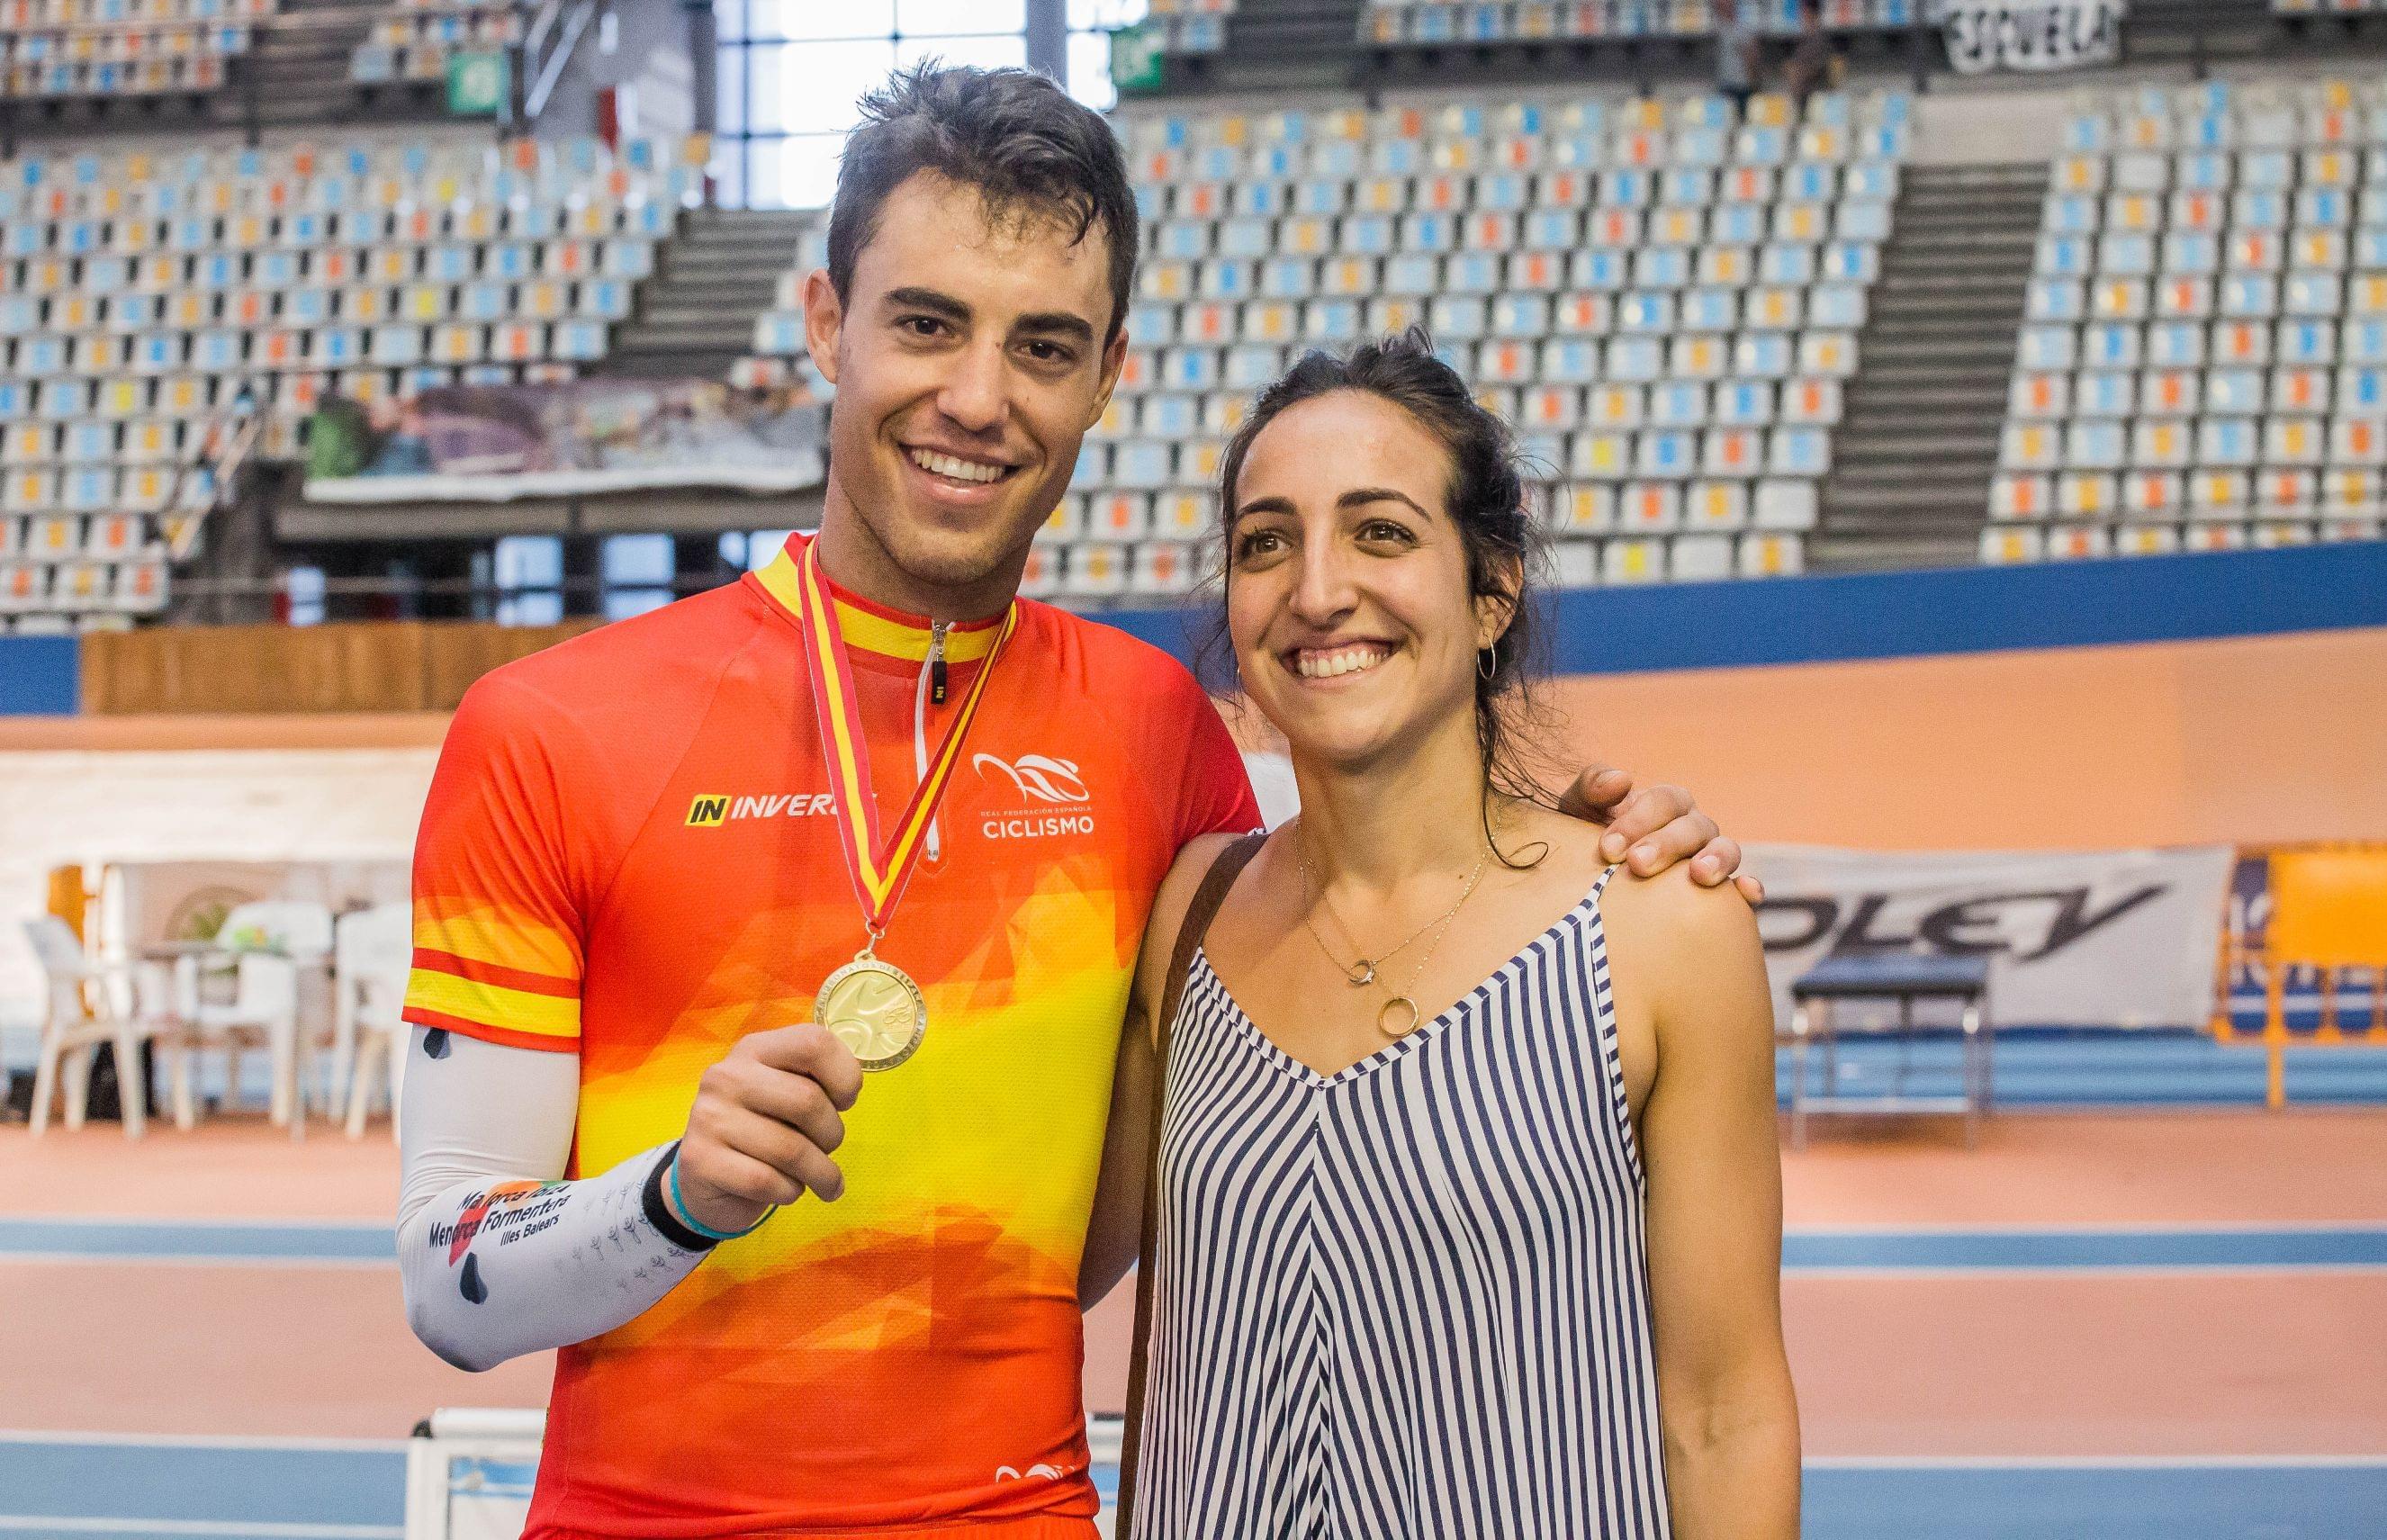 Campeonato de España de Pista 2018 / Valencia